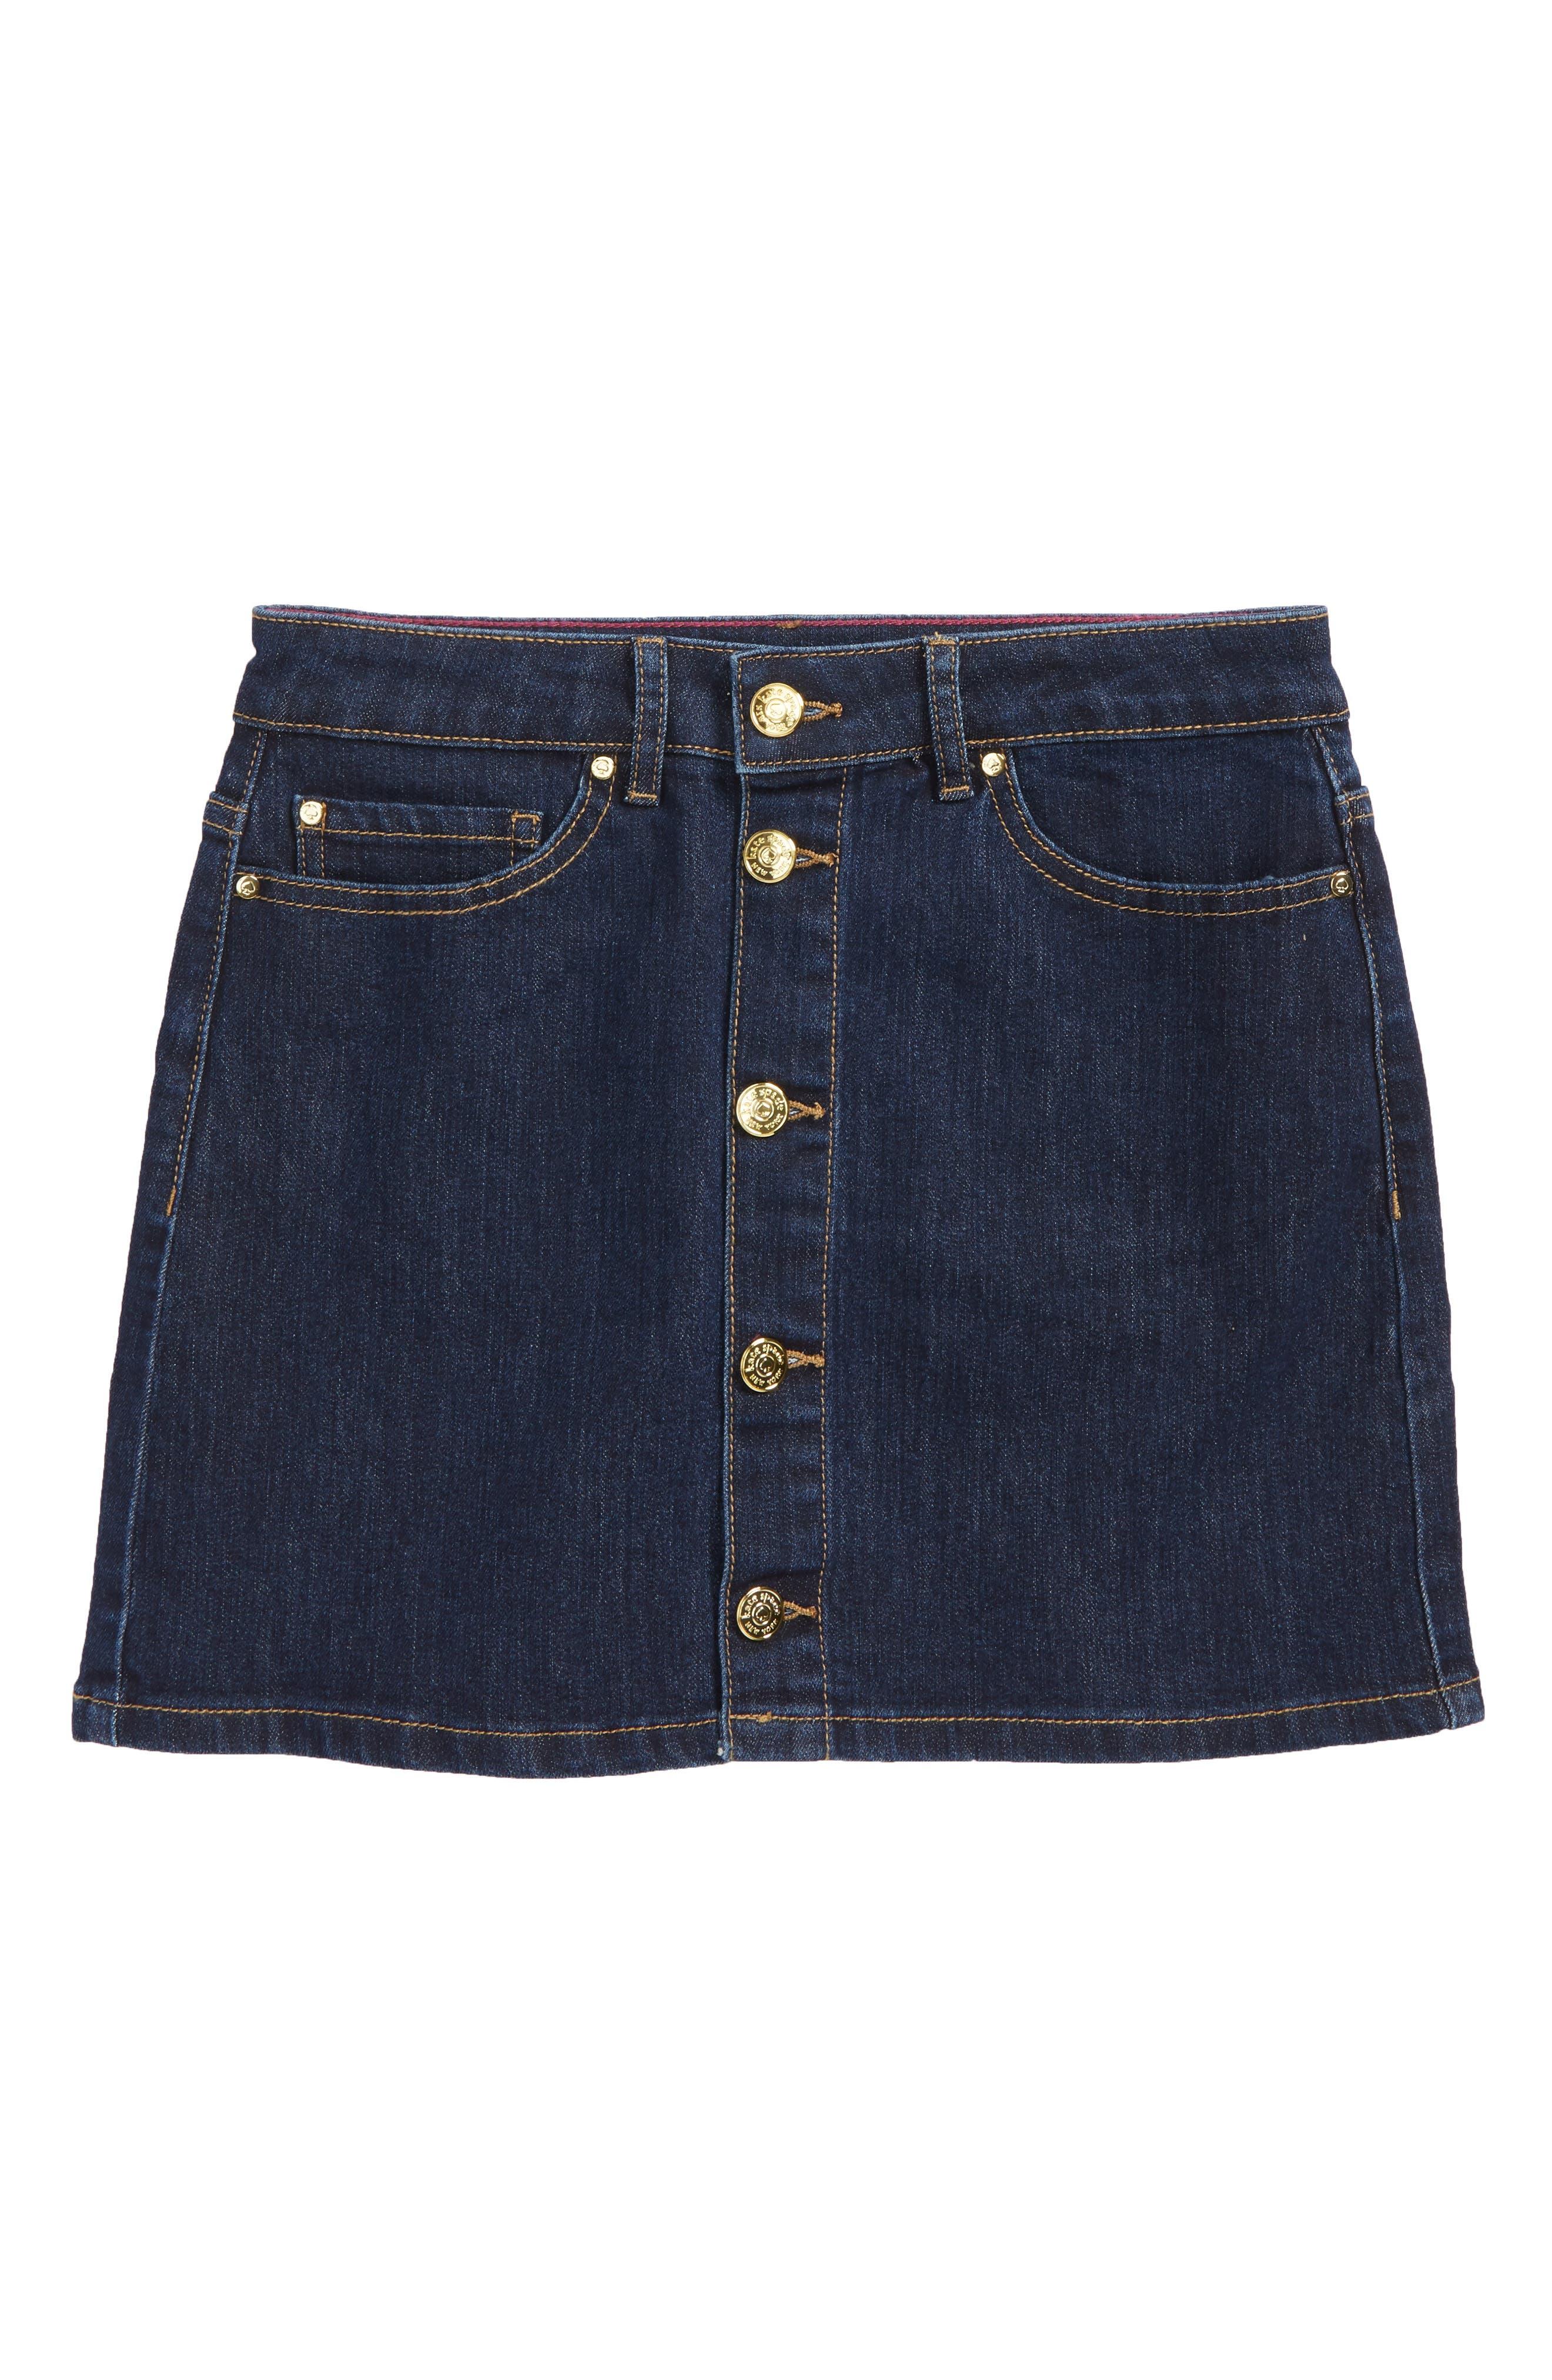 denim skirt,                         Main,                         color, 402